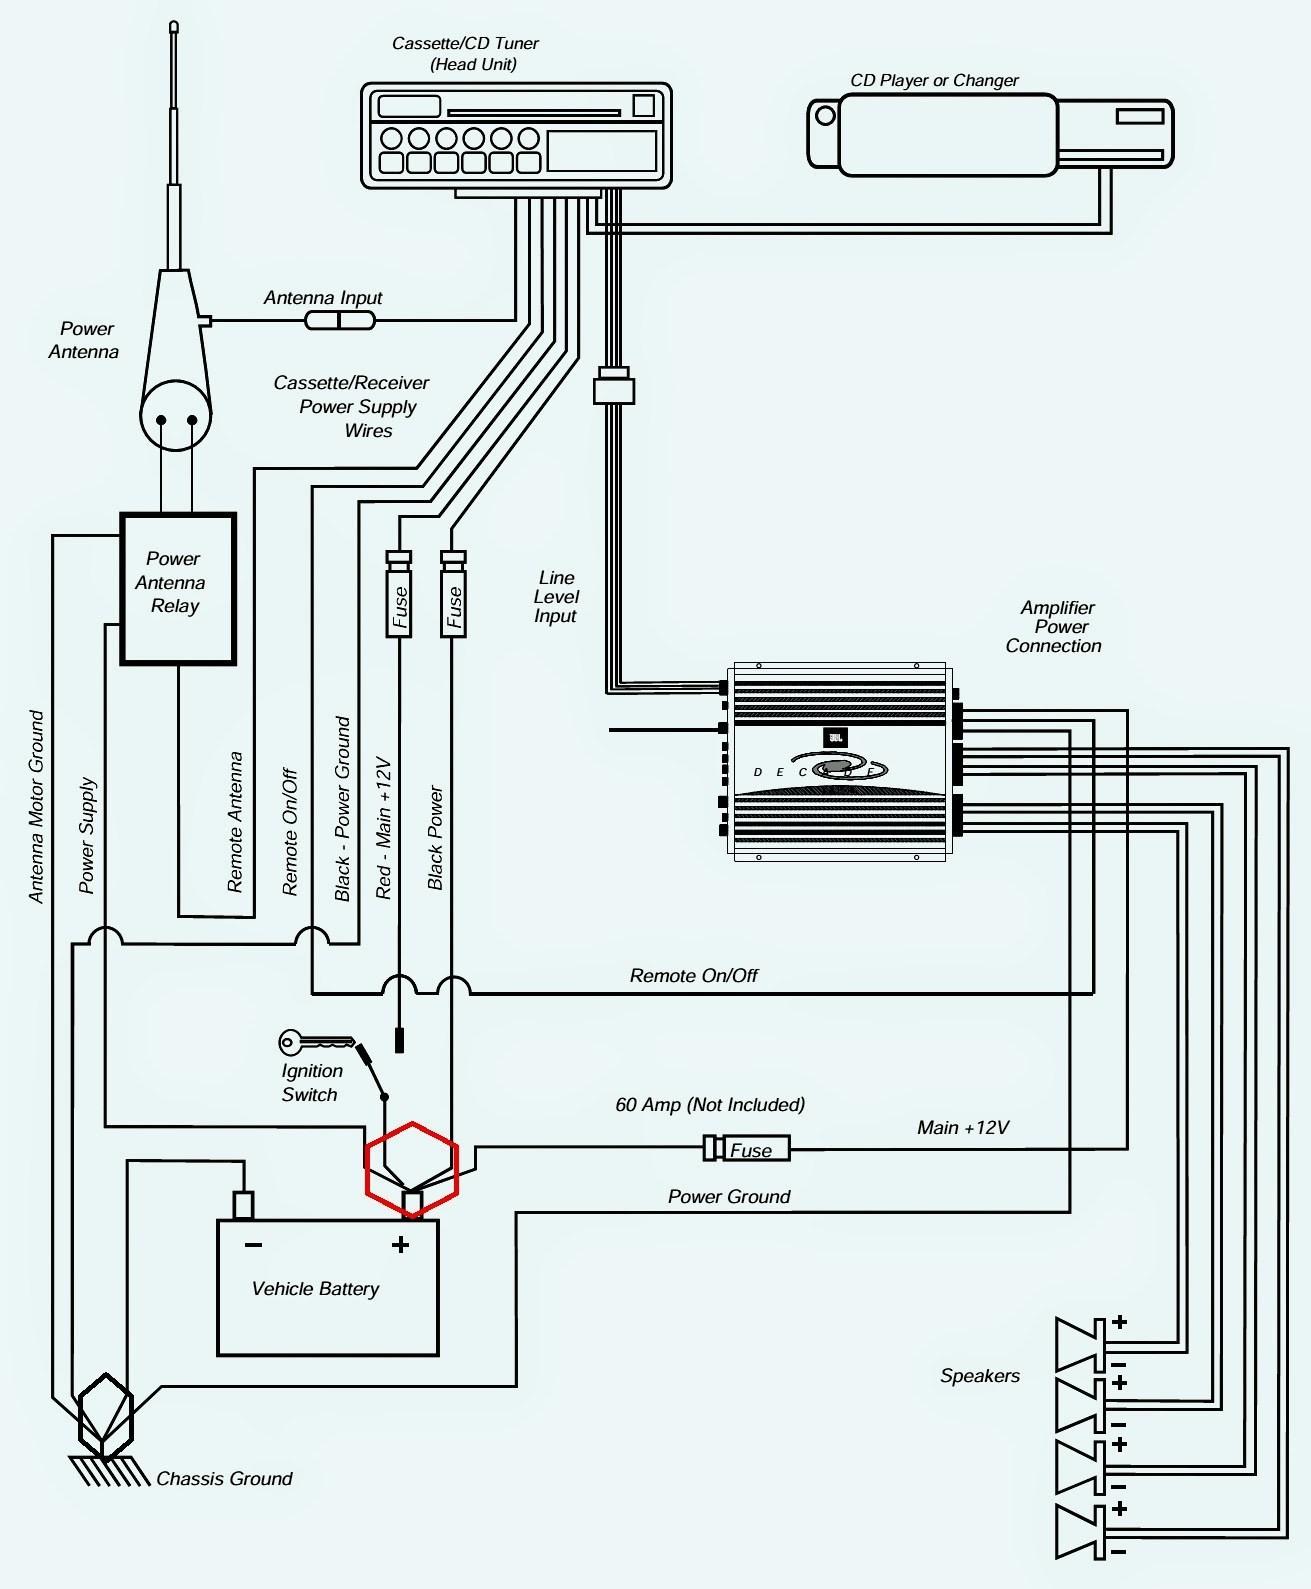 Wiring Diagram Car Stereo Save Wiring Diagram For Pioneer Car Stereo Inspirationa Inspirational Car